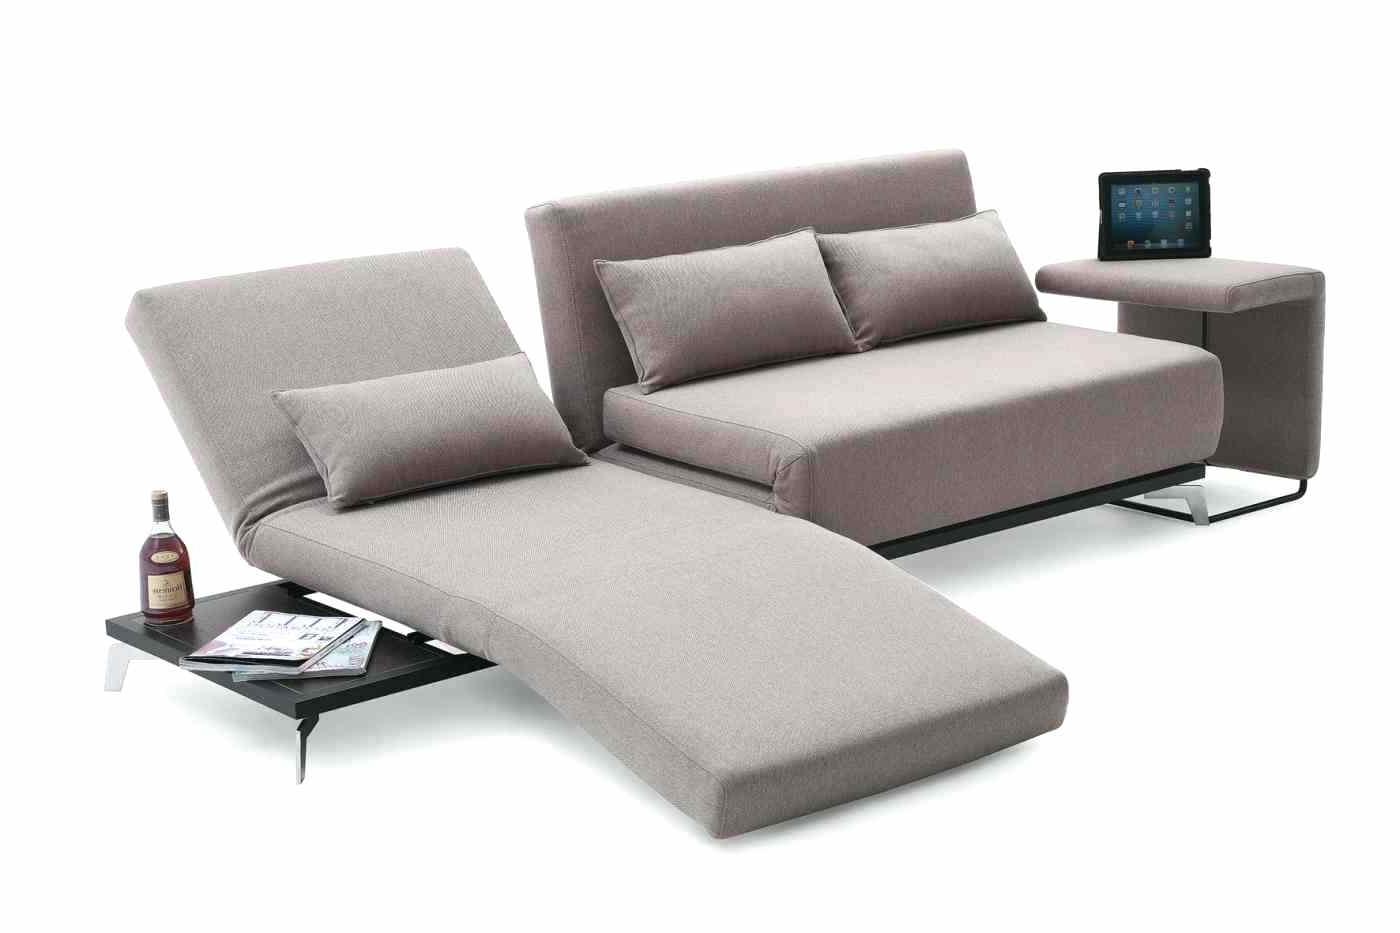 Mini Sofa – Ristovski Pertaining To Popular Mini Sofas (View 4 of 20)